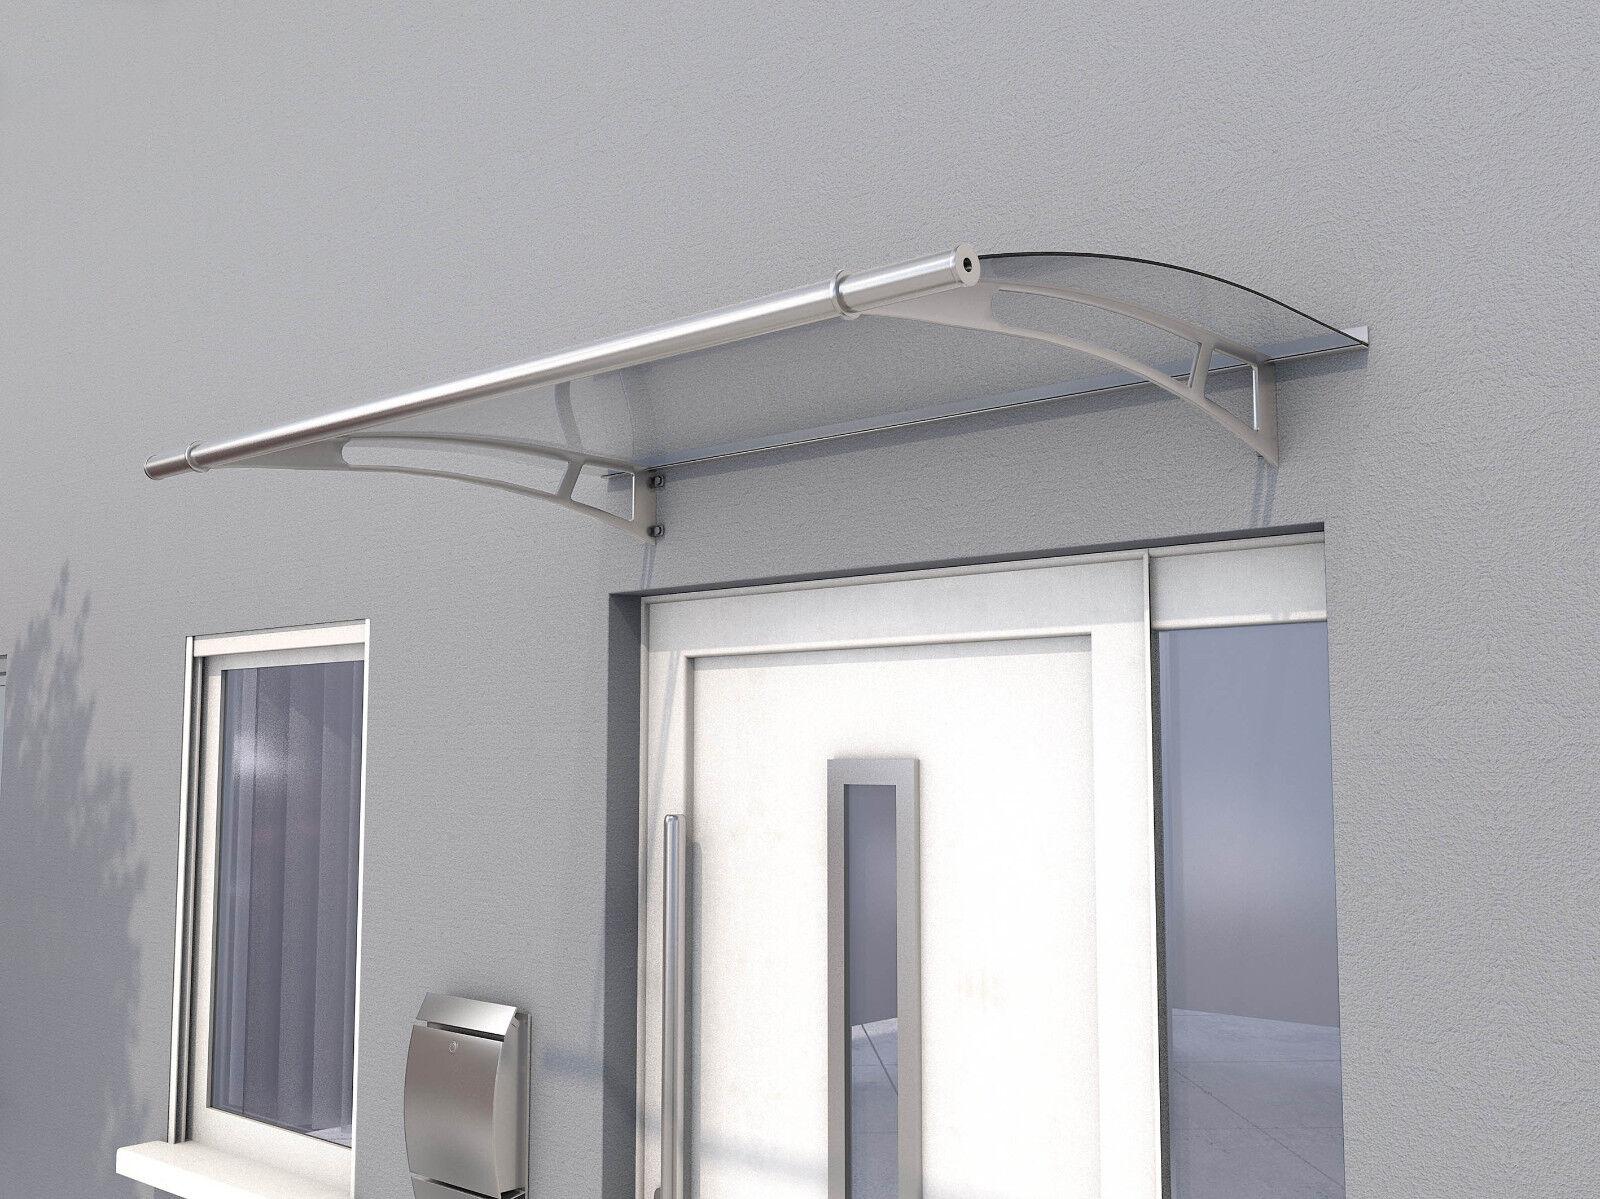 Gutta Pultvordach PT/L 150 klar - Haustürvordach 150 150 150 x 95 cm mit Acrylglas 48d672